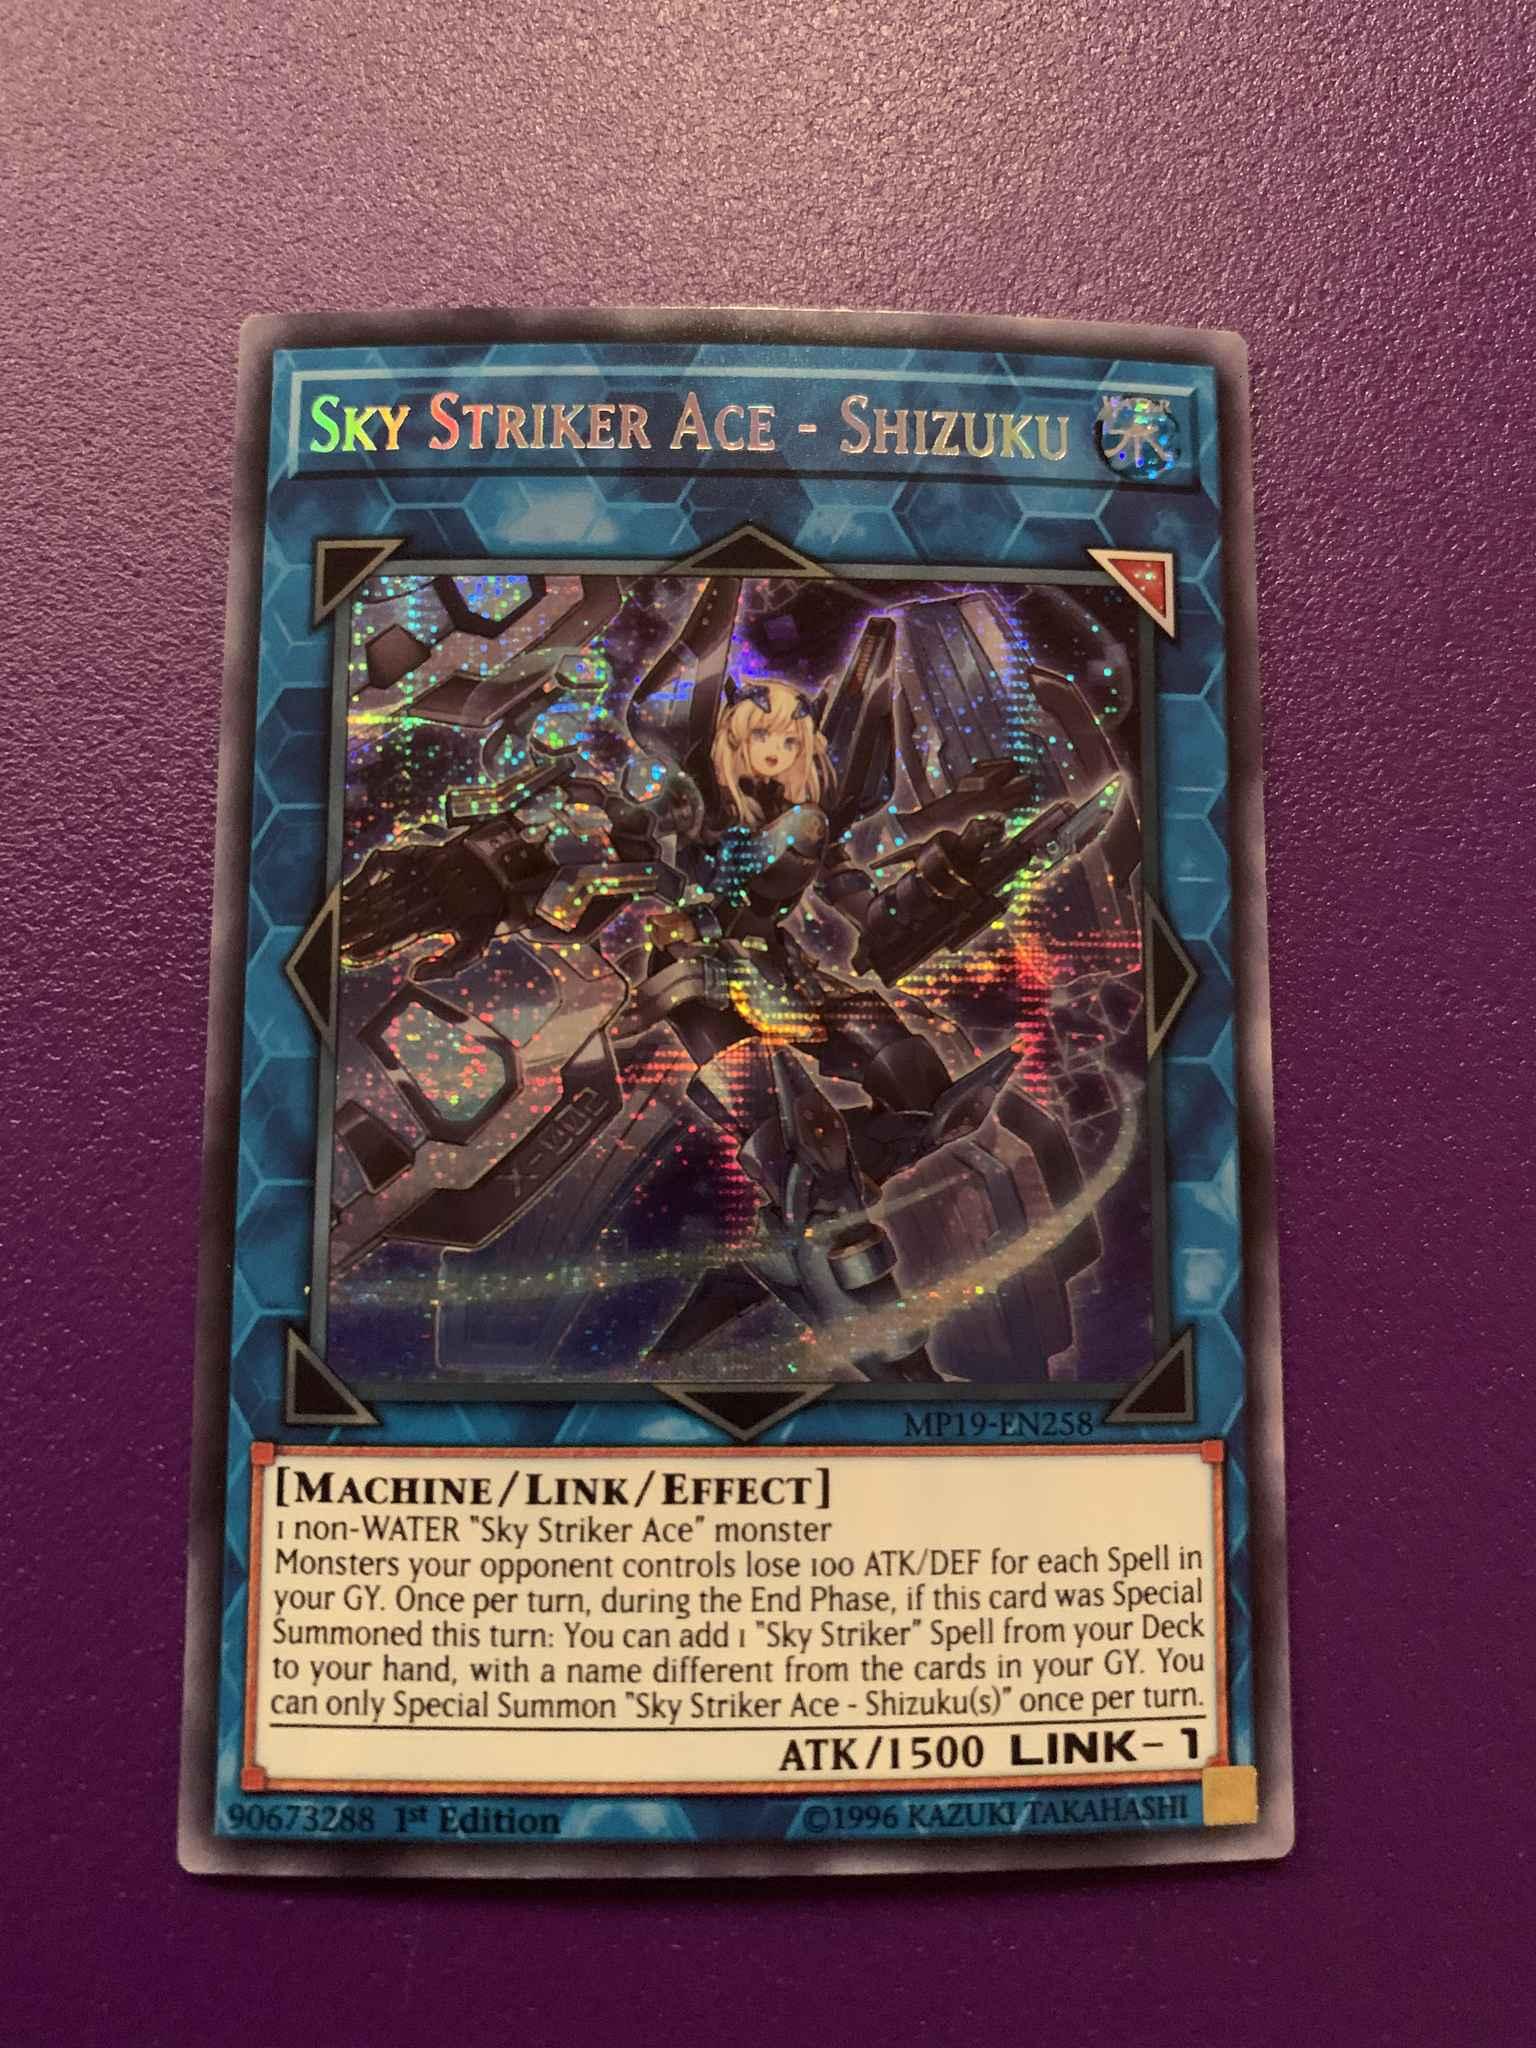 MP19-EN258 2019 Gold Sarcophagus Tin Mega Pack Shizuku Sky Striker Ace